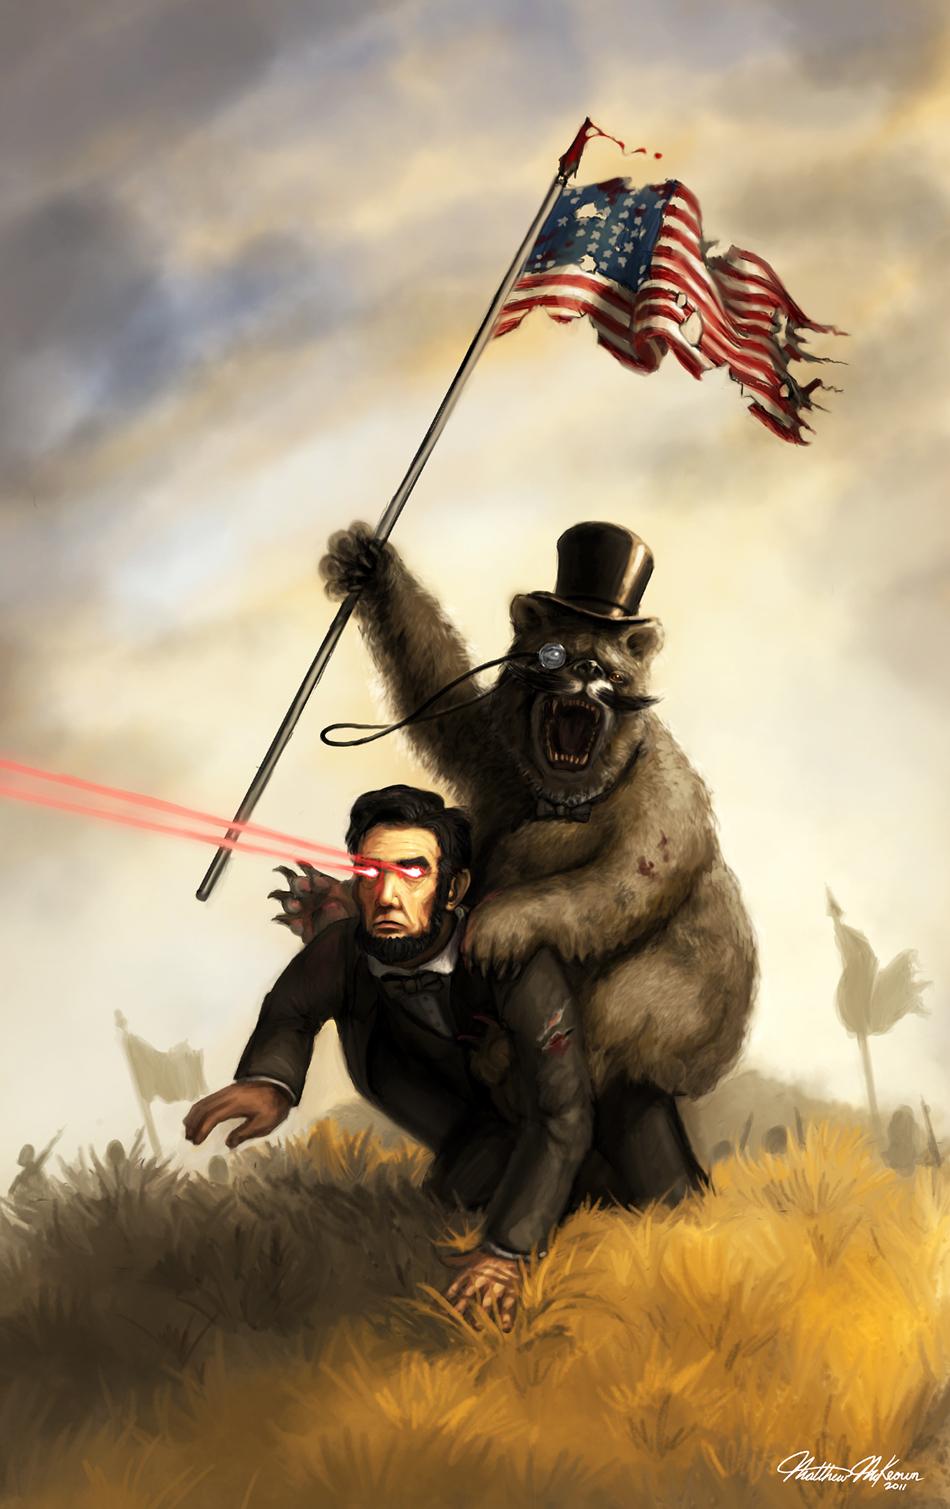 The Civil War by Kanaru92